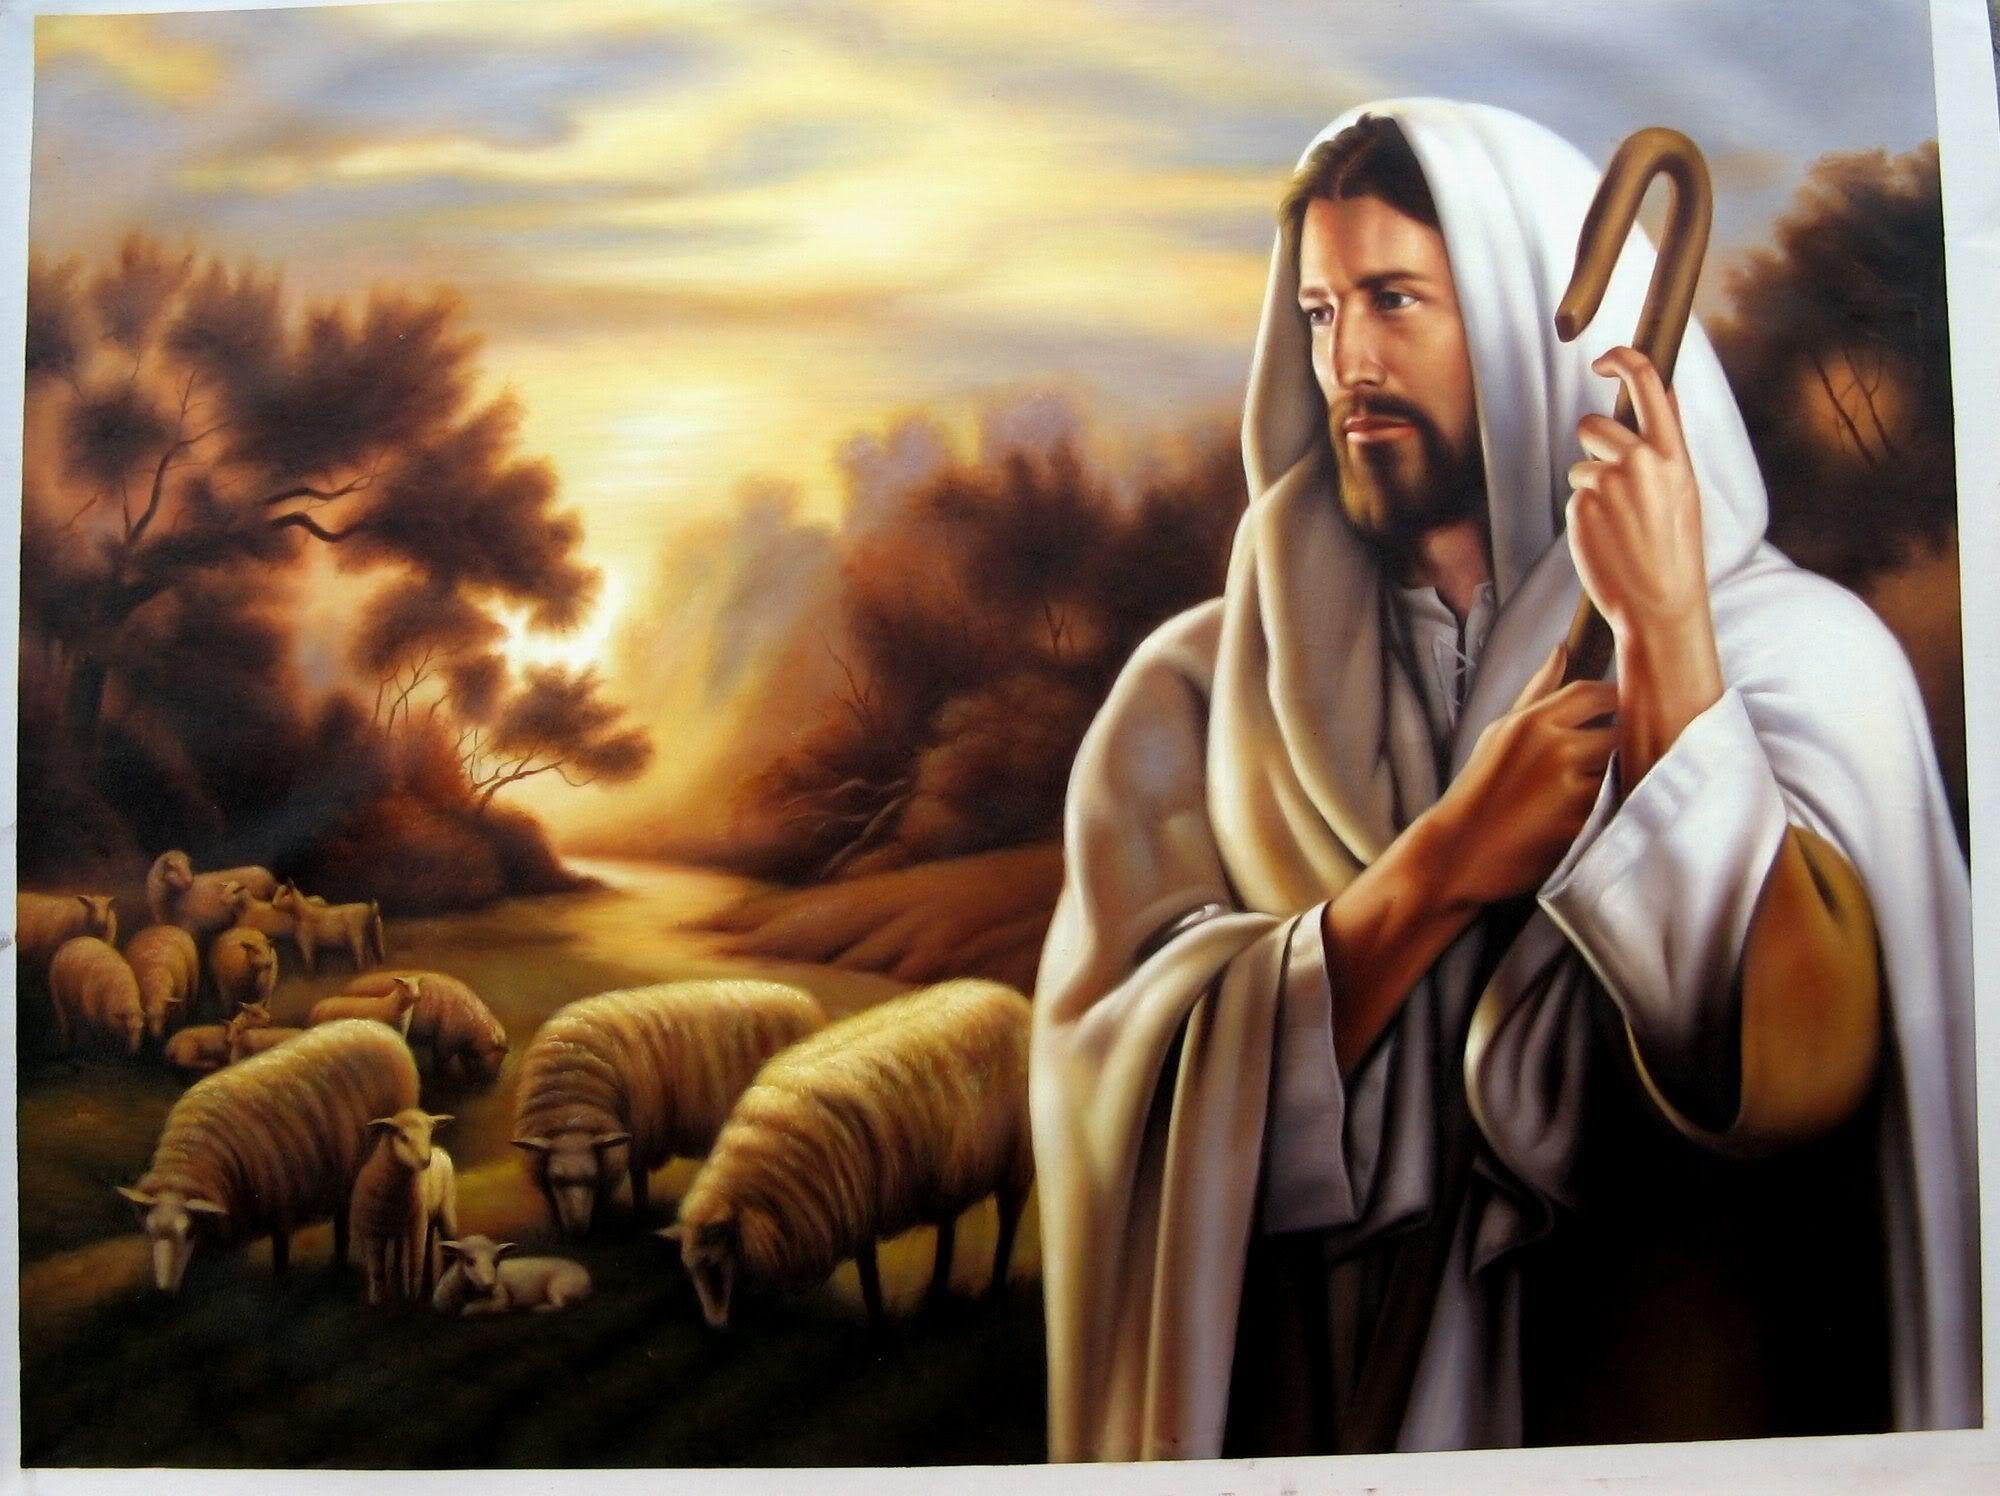 Jesus Hd Wallpapers 1080p Windows Jesus Wallpaper Christ The Good Shepherd Parables Of Jesus